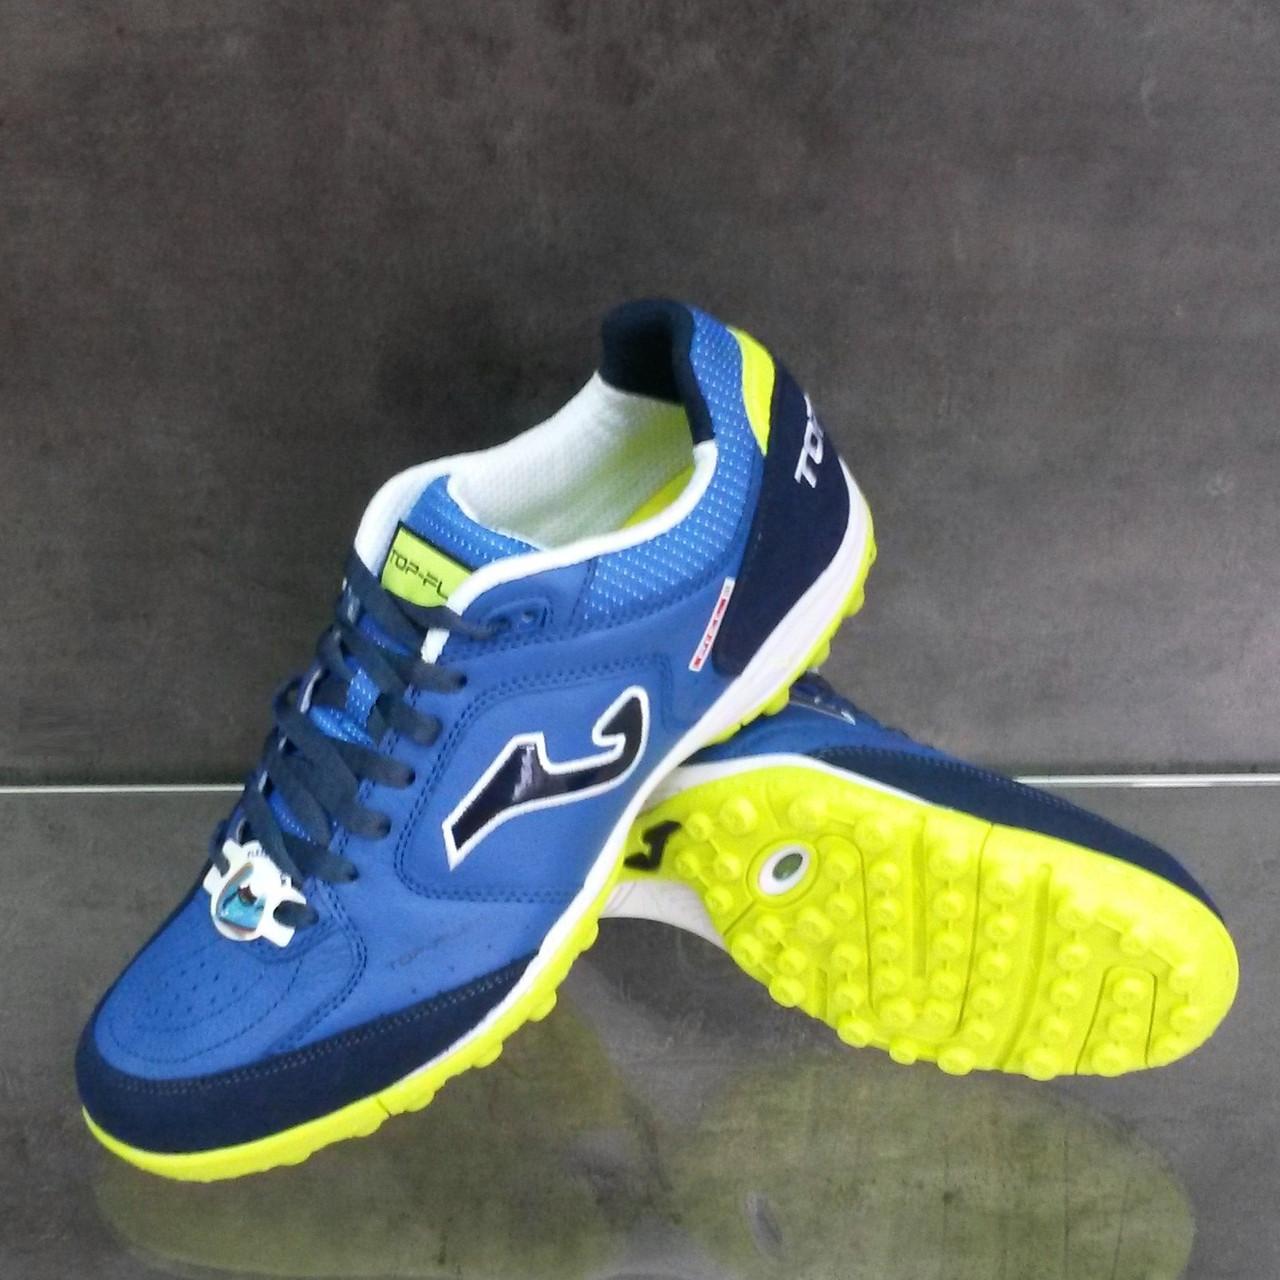 Обувь для футбола (cороконожки) Joma Top Flex